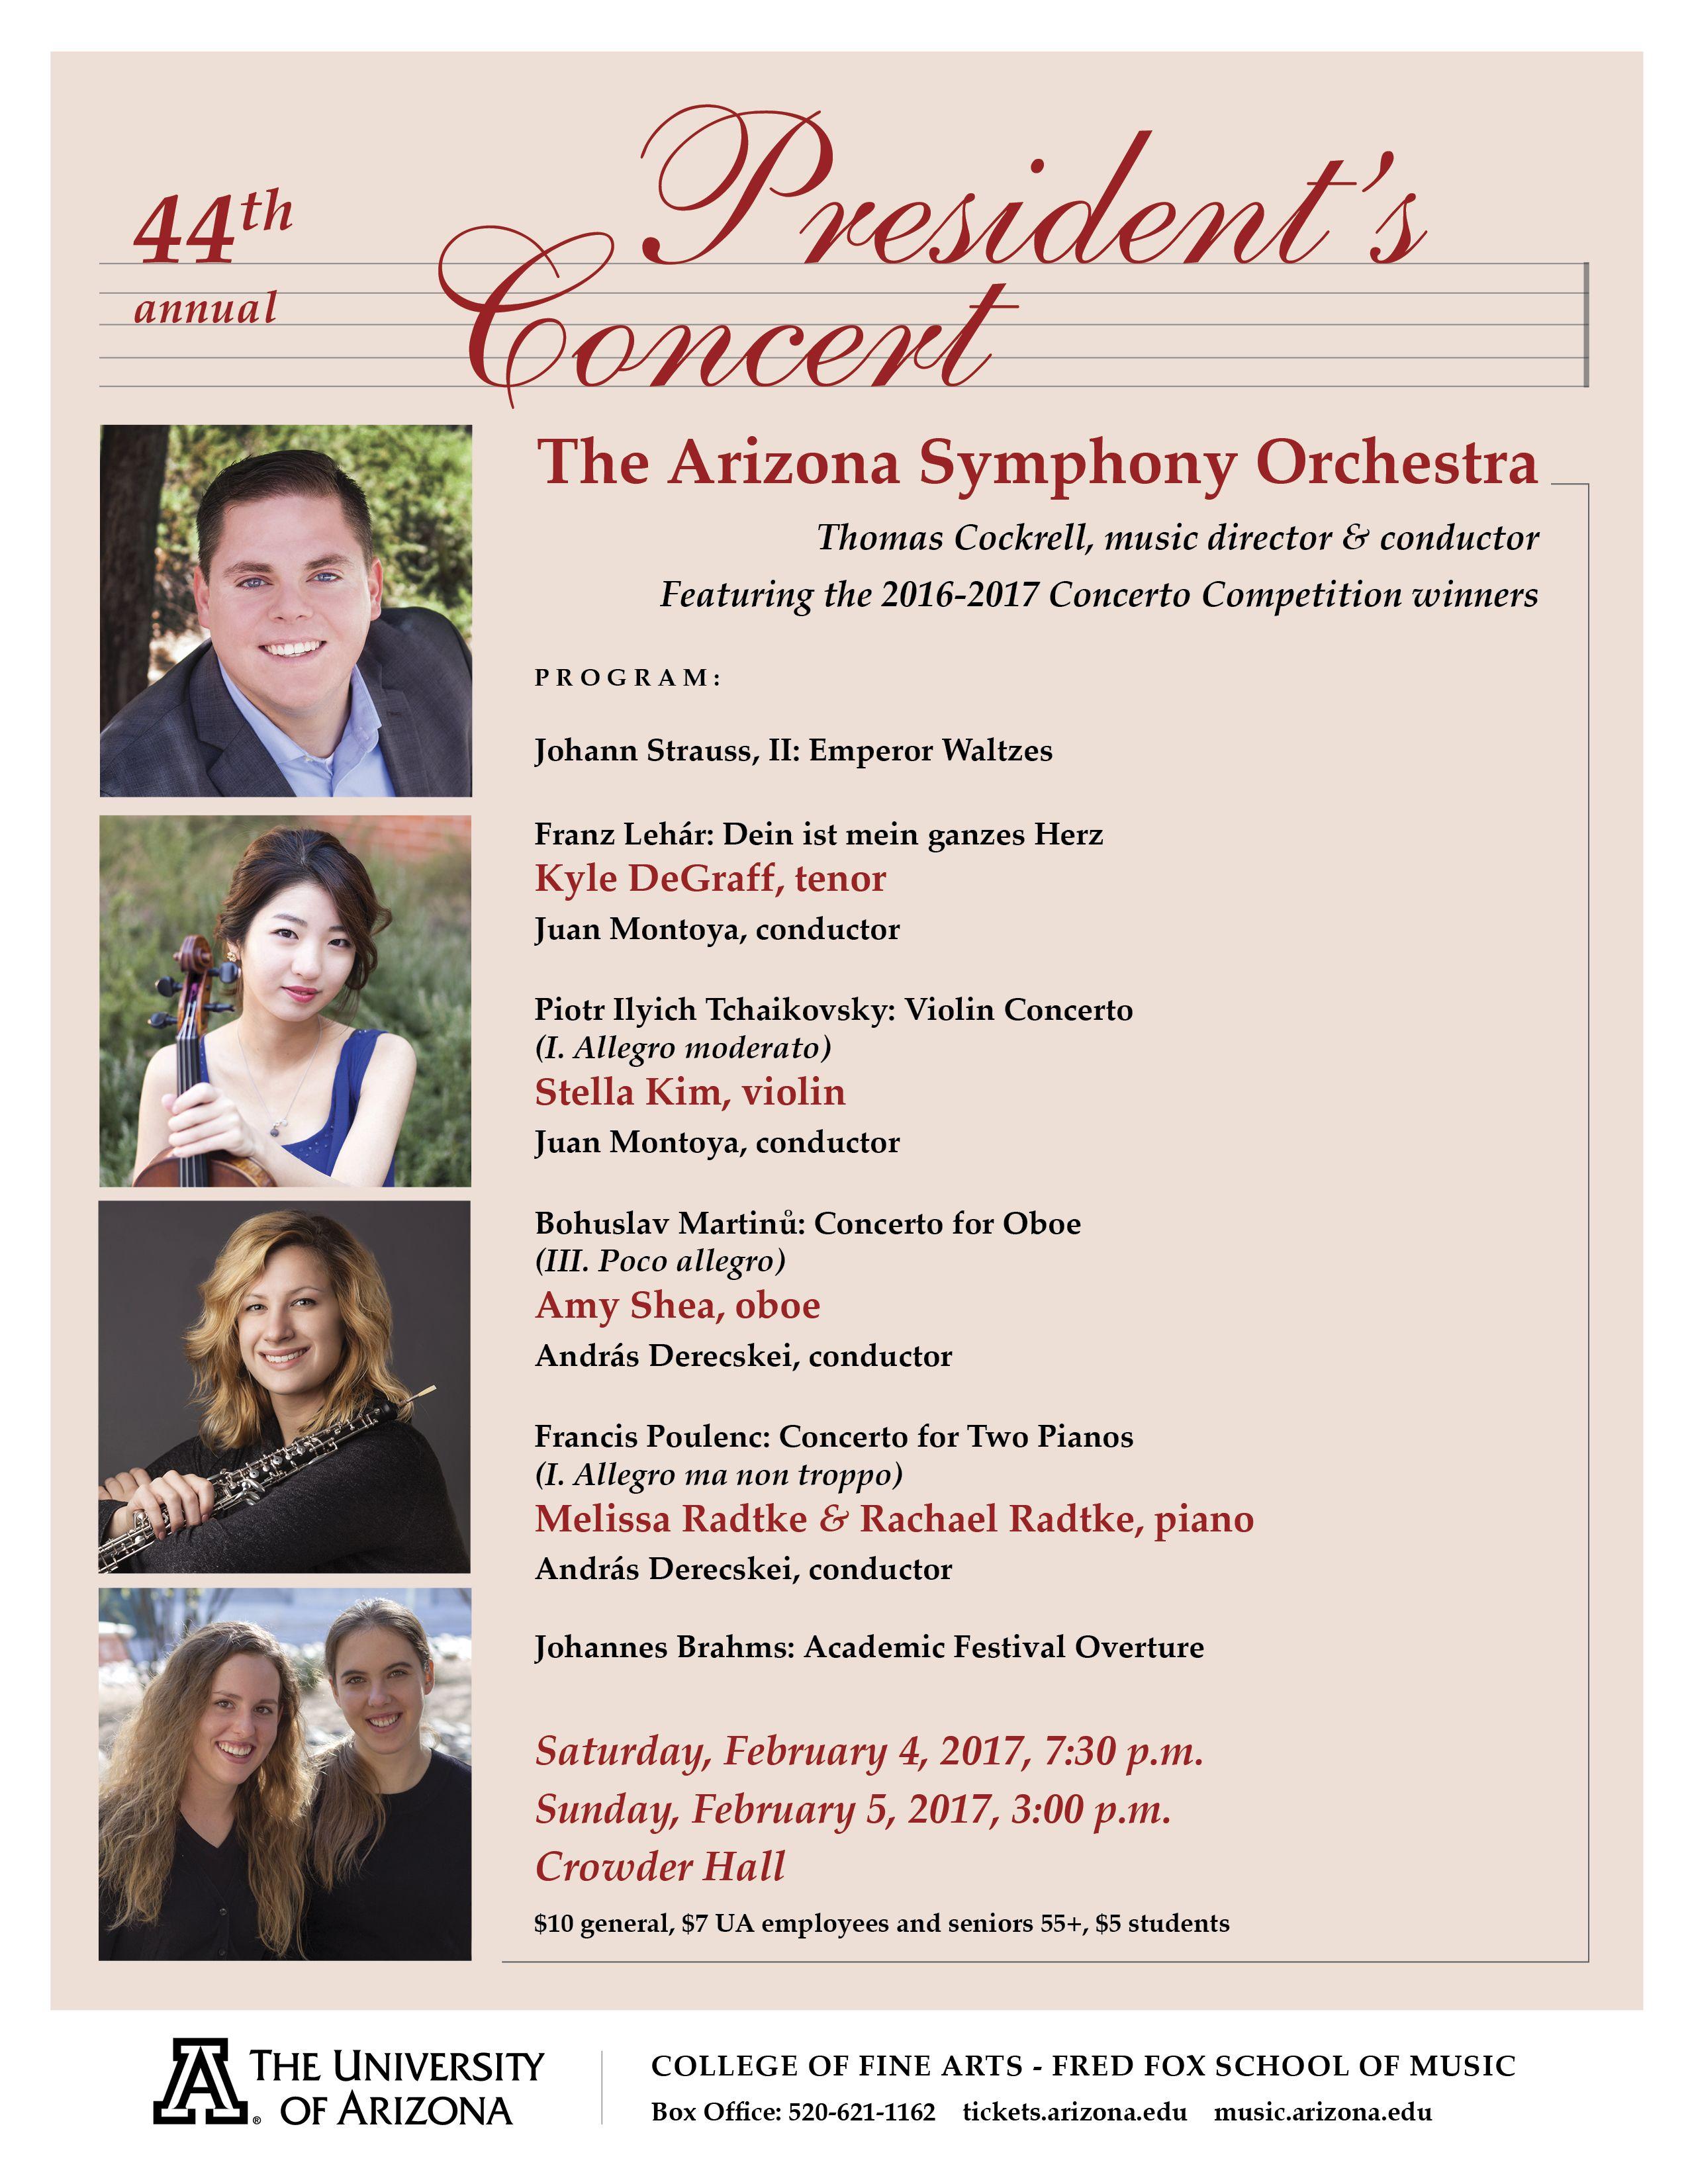 School Of Music At The University Of Arizona Arizona Symphony Orchestra 44th Annual President S Concert Arizona School University Of Arizona Music